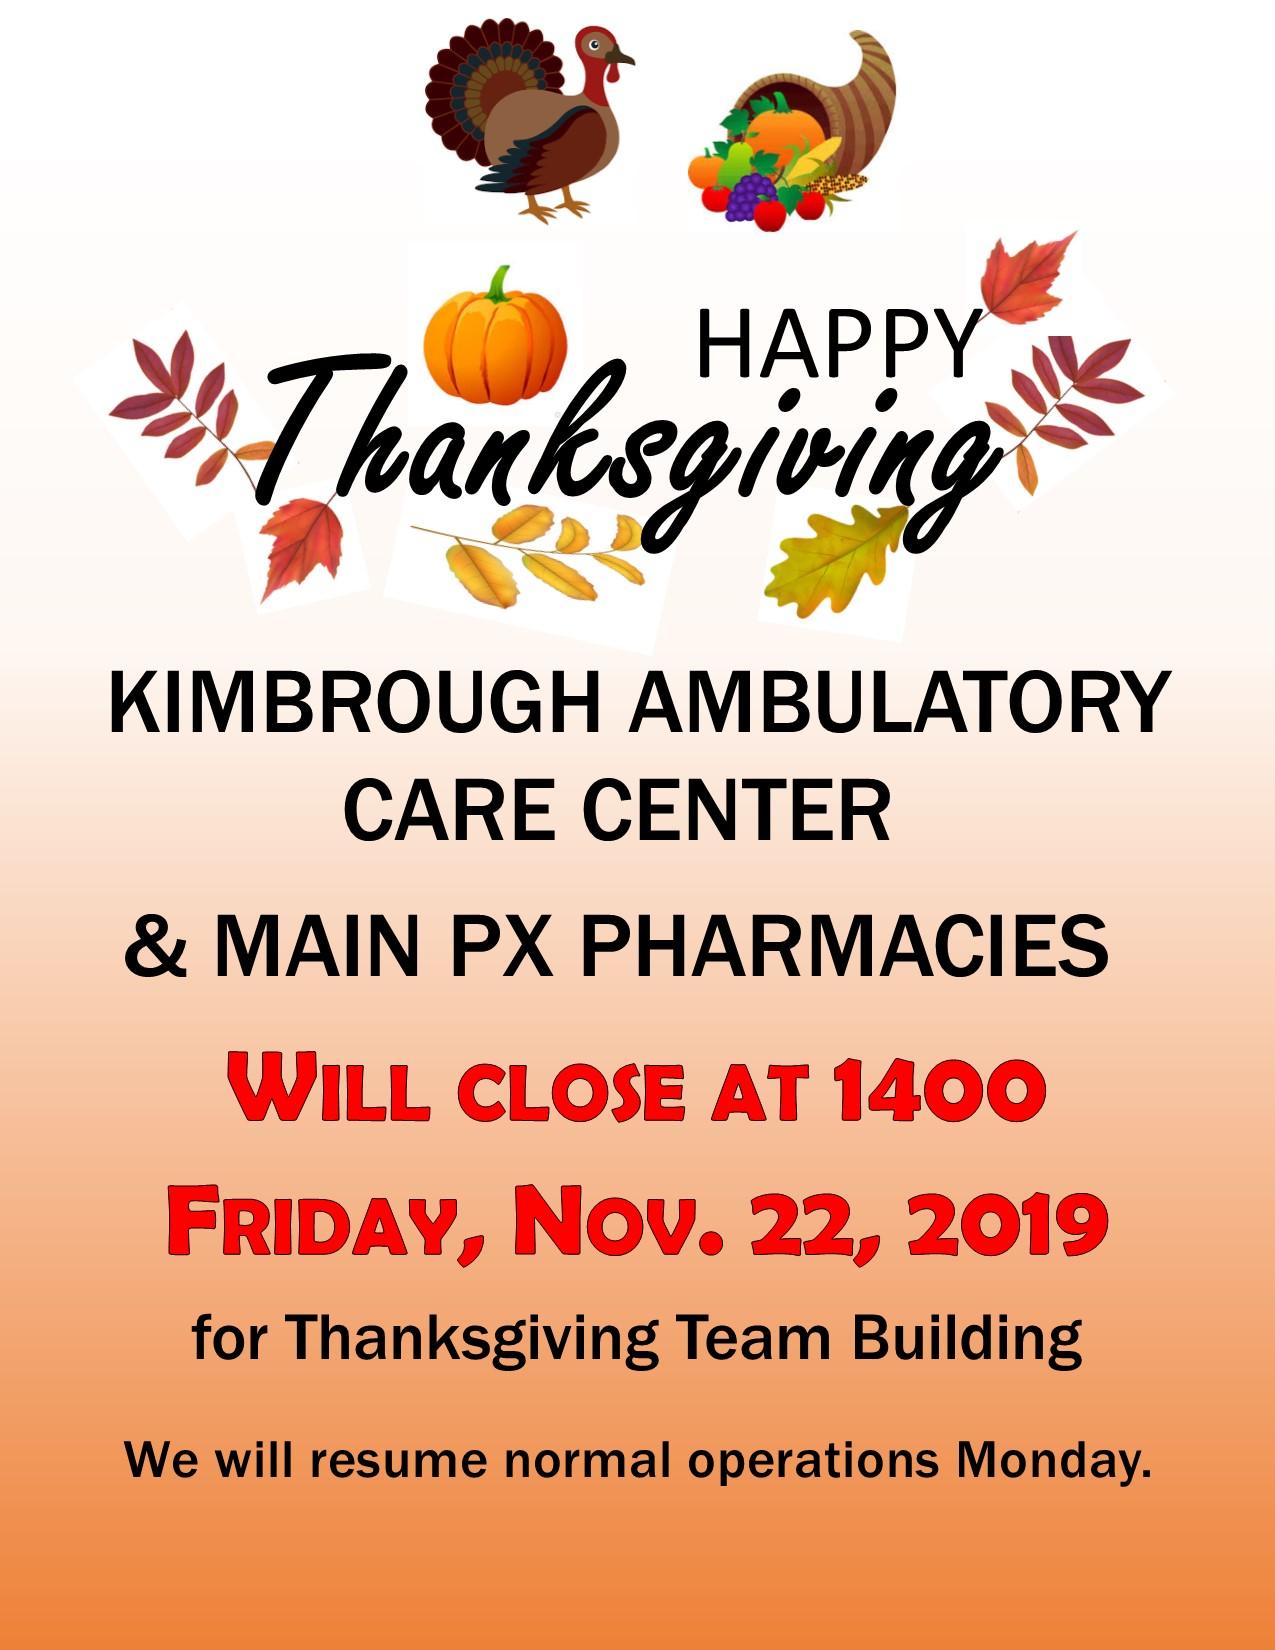 Early Closure Friday 22 Nov Thanksgiving Team Building